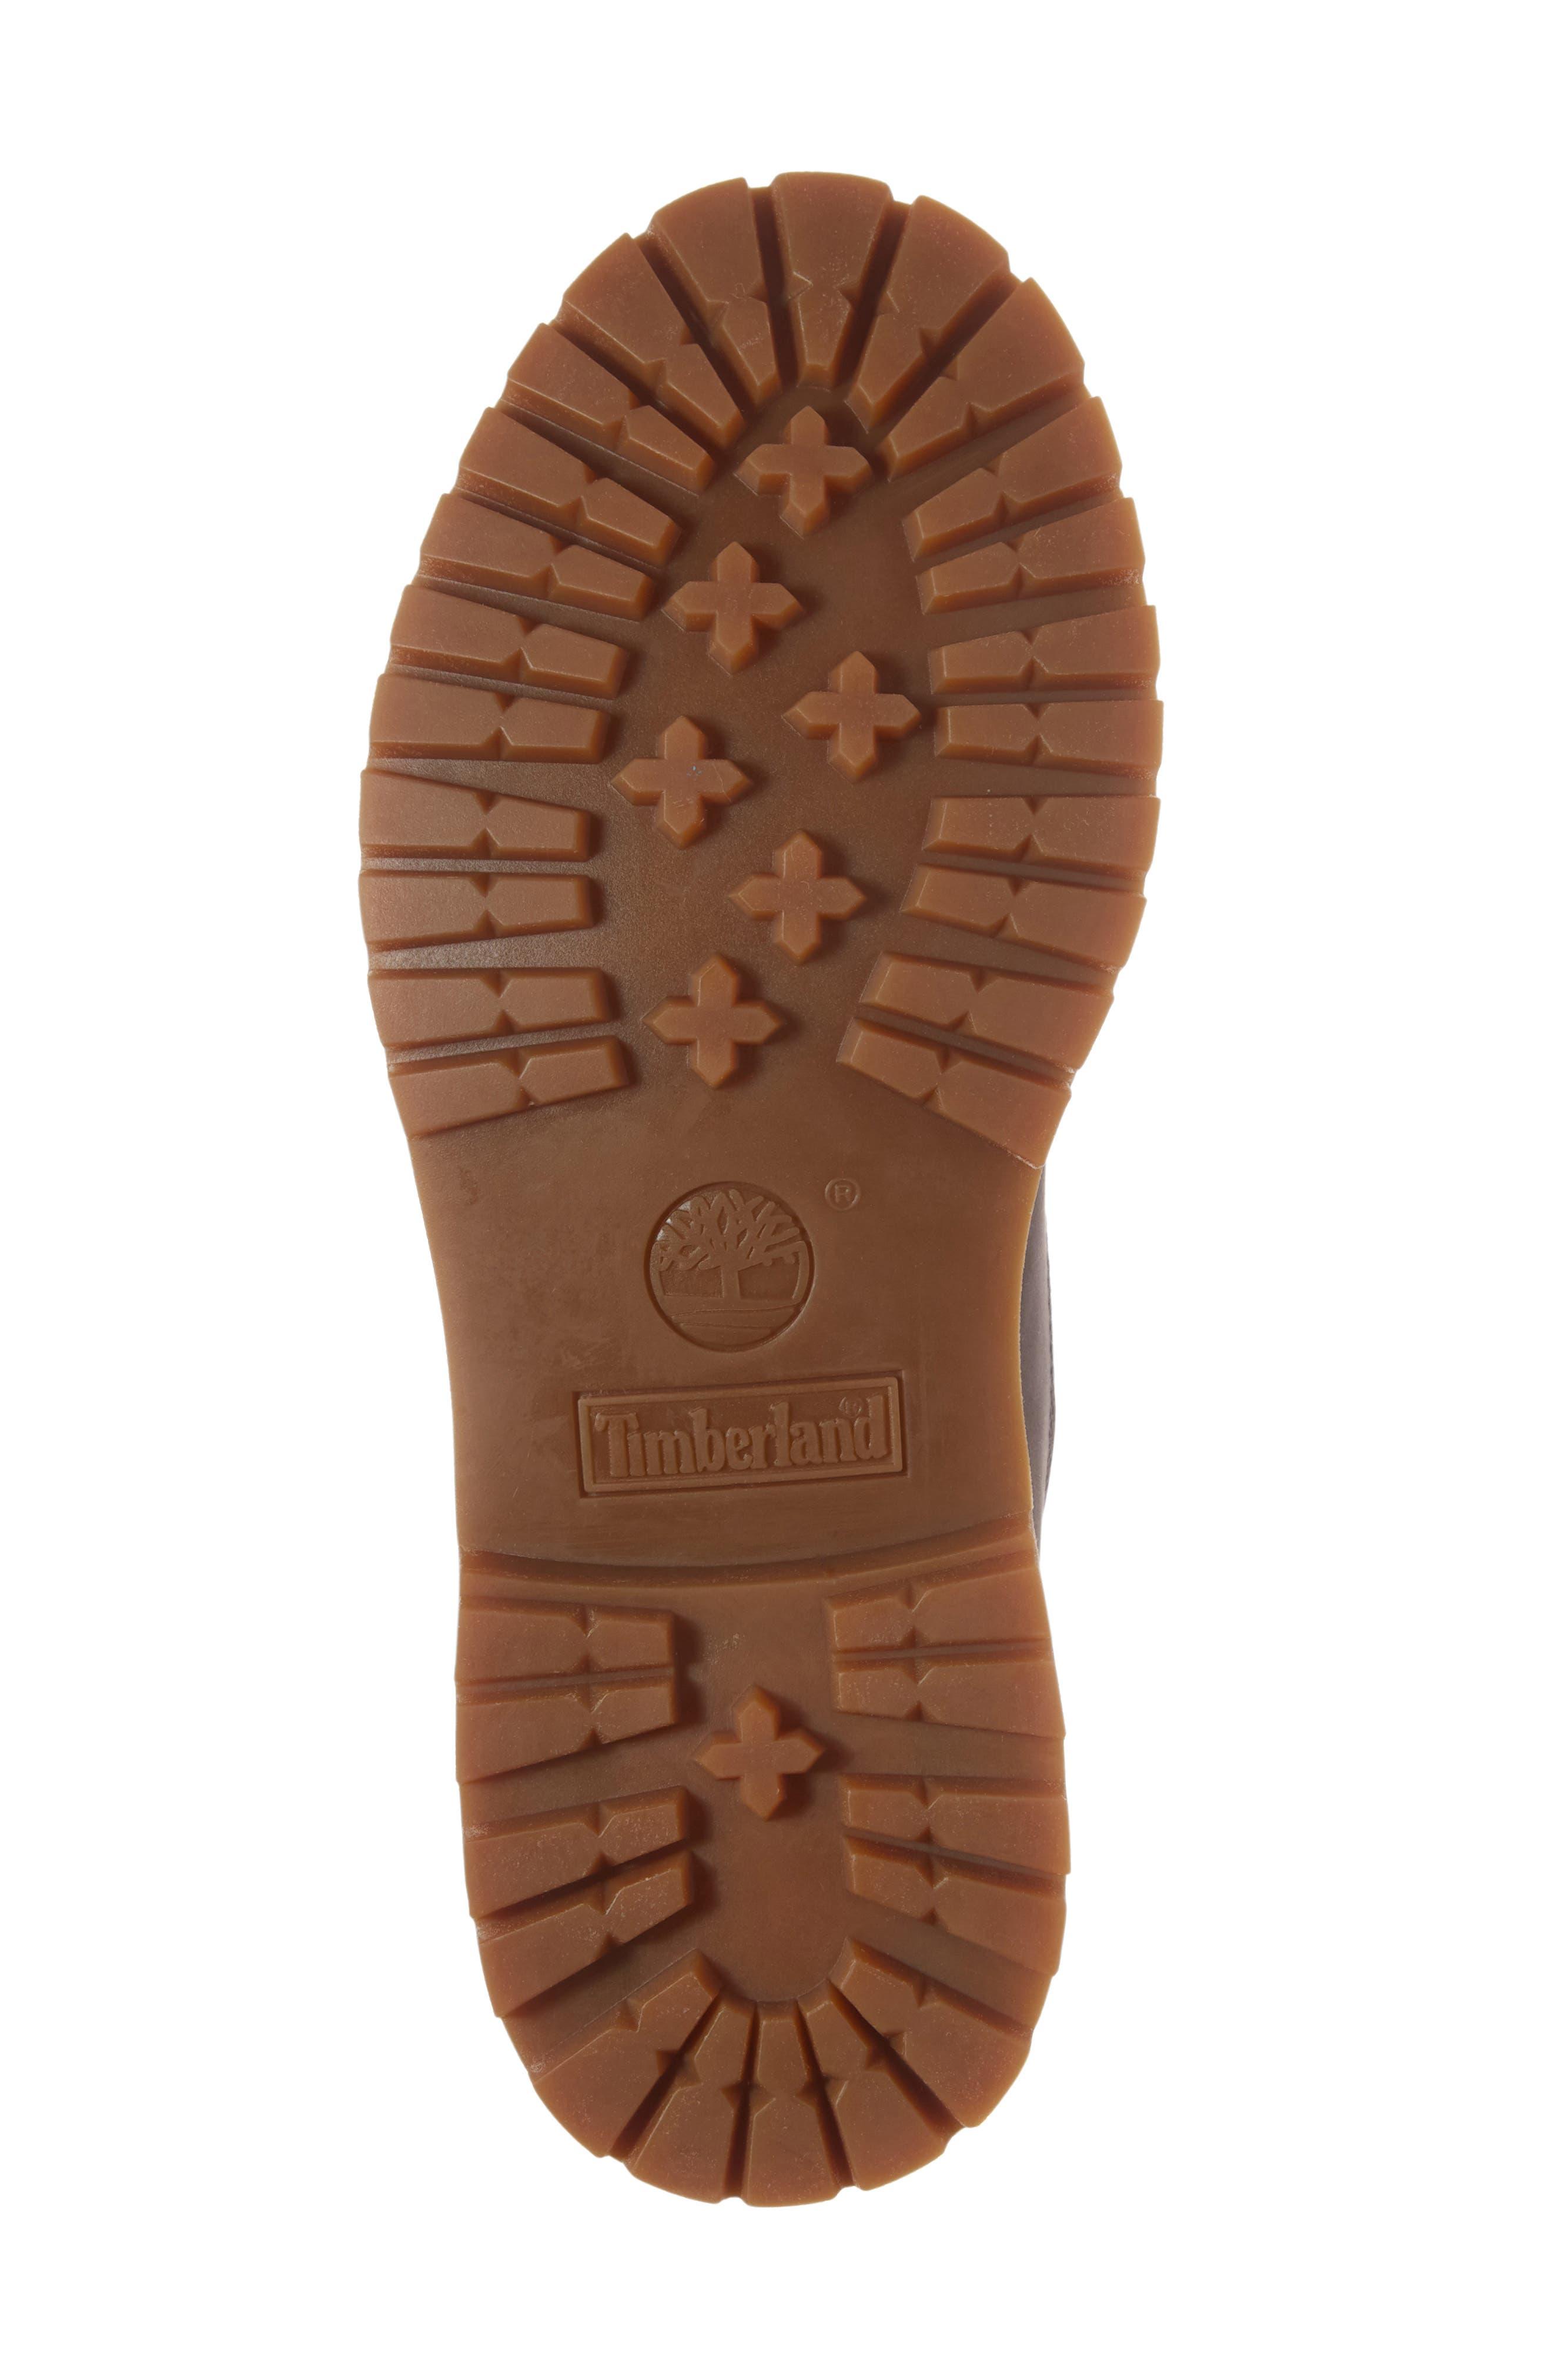 6-Inch Premium Embossed Waterproof Boot,                             Alternate thumbnail 6, color,                             021